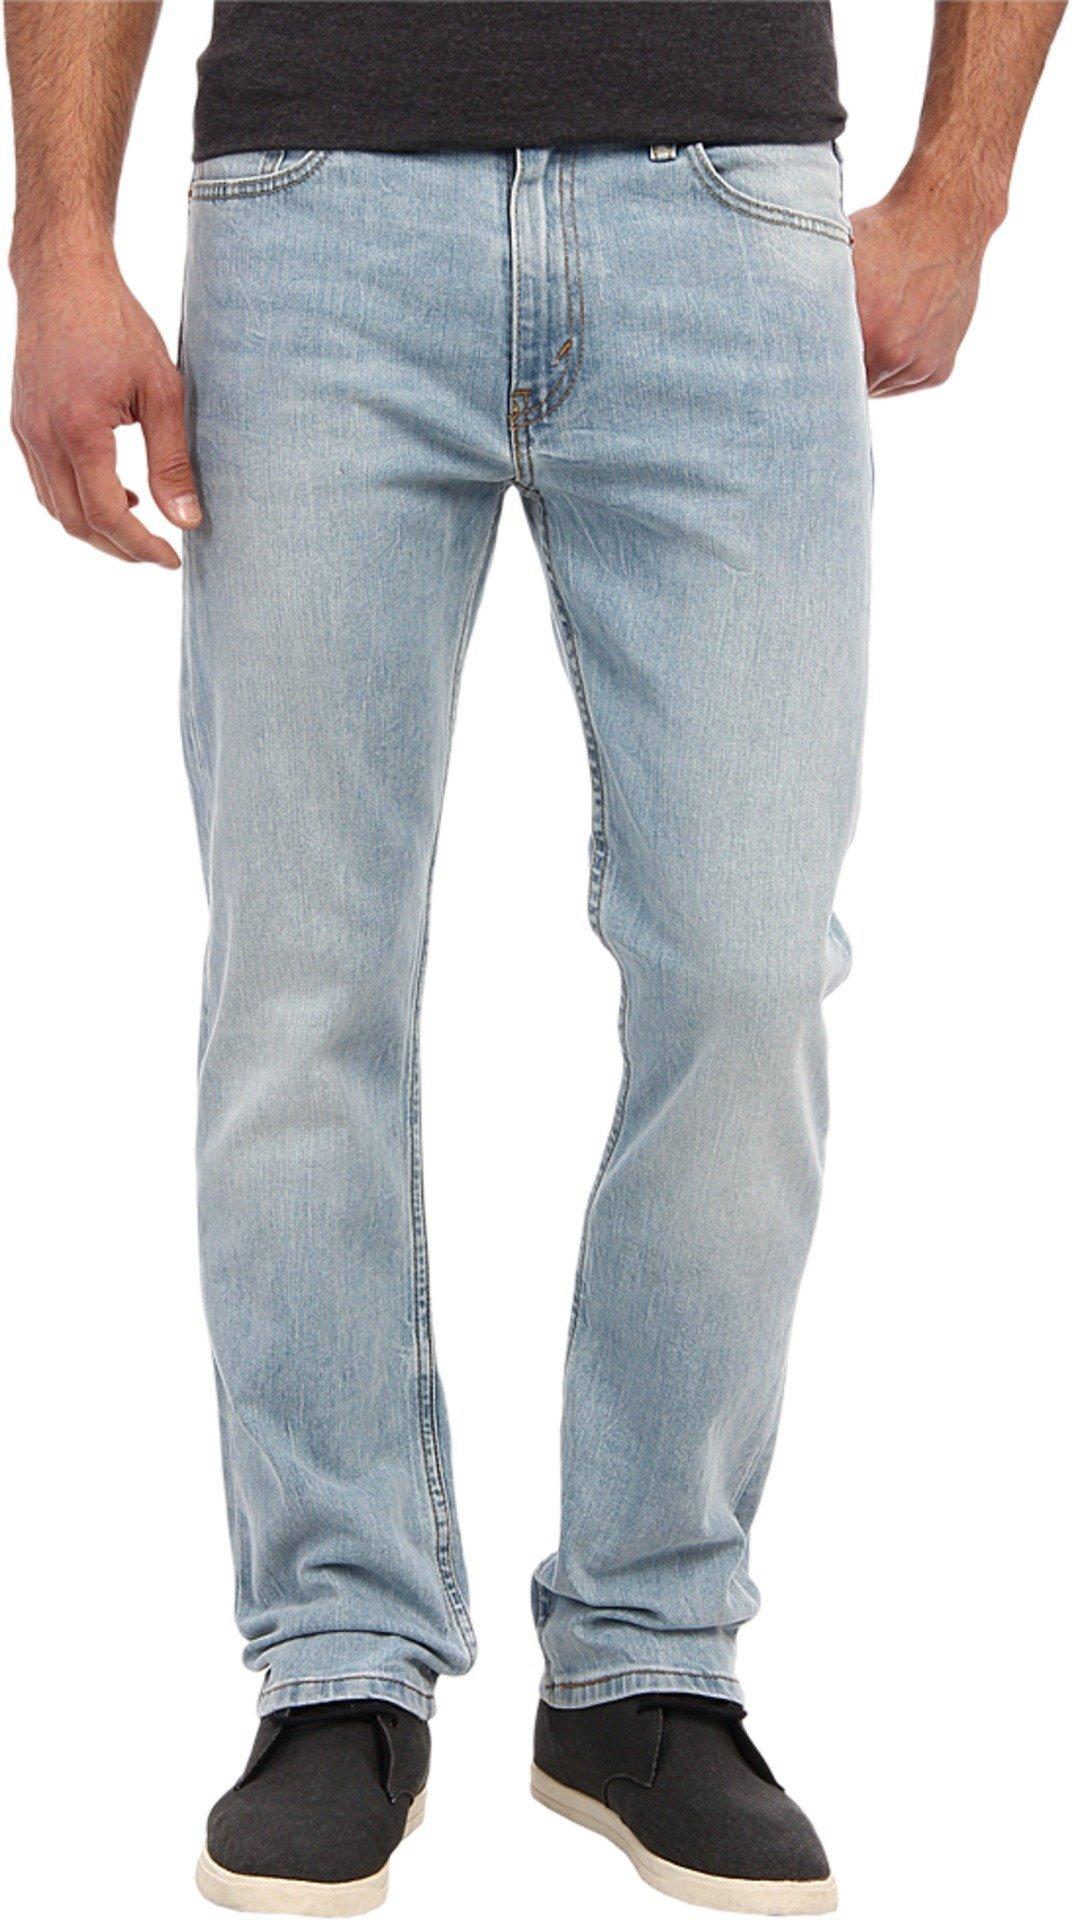 Levi's Men's 513 Stretch Slim Straight Jean, Blue Stone, 34x30